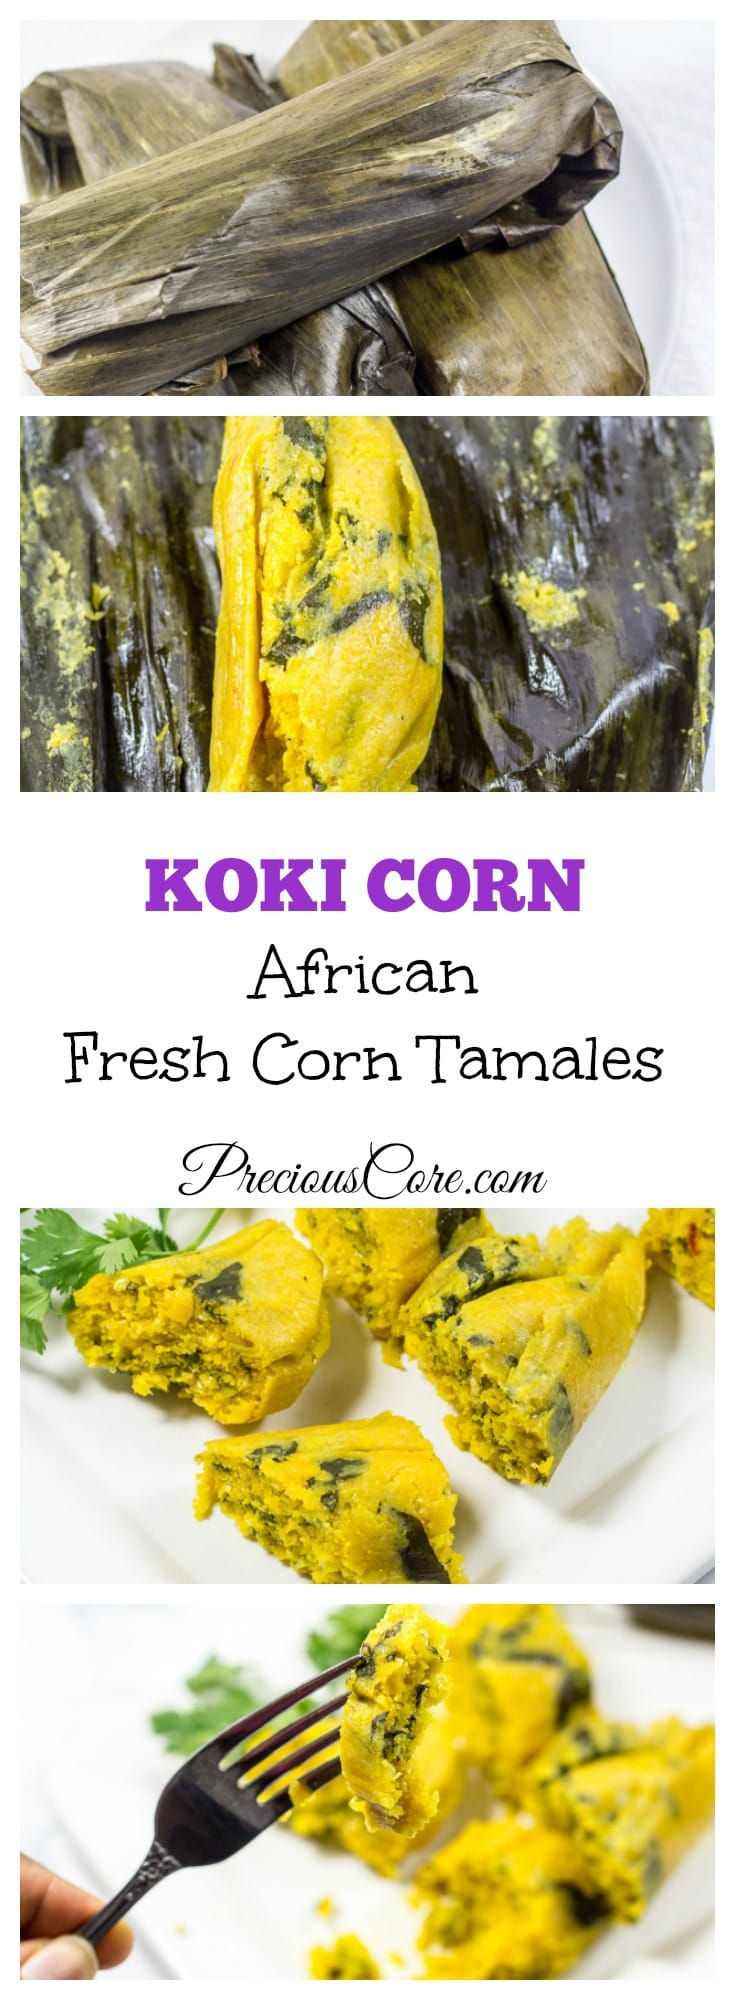 The best koki corn recipe - fresh corn tamales